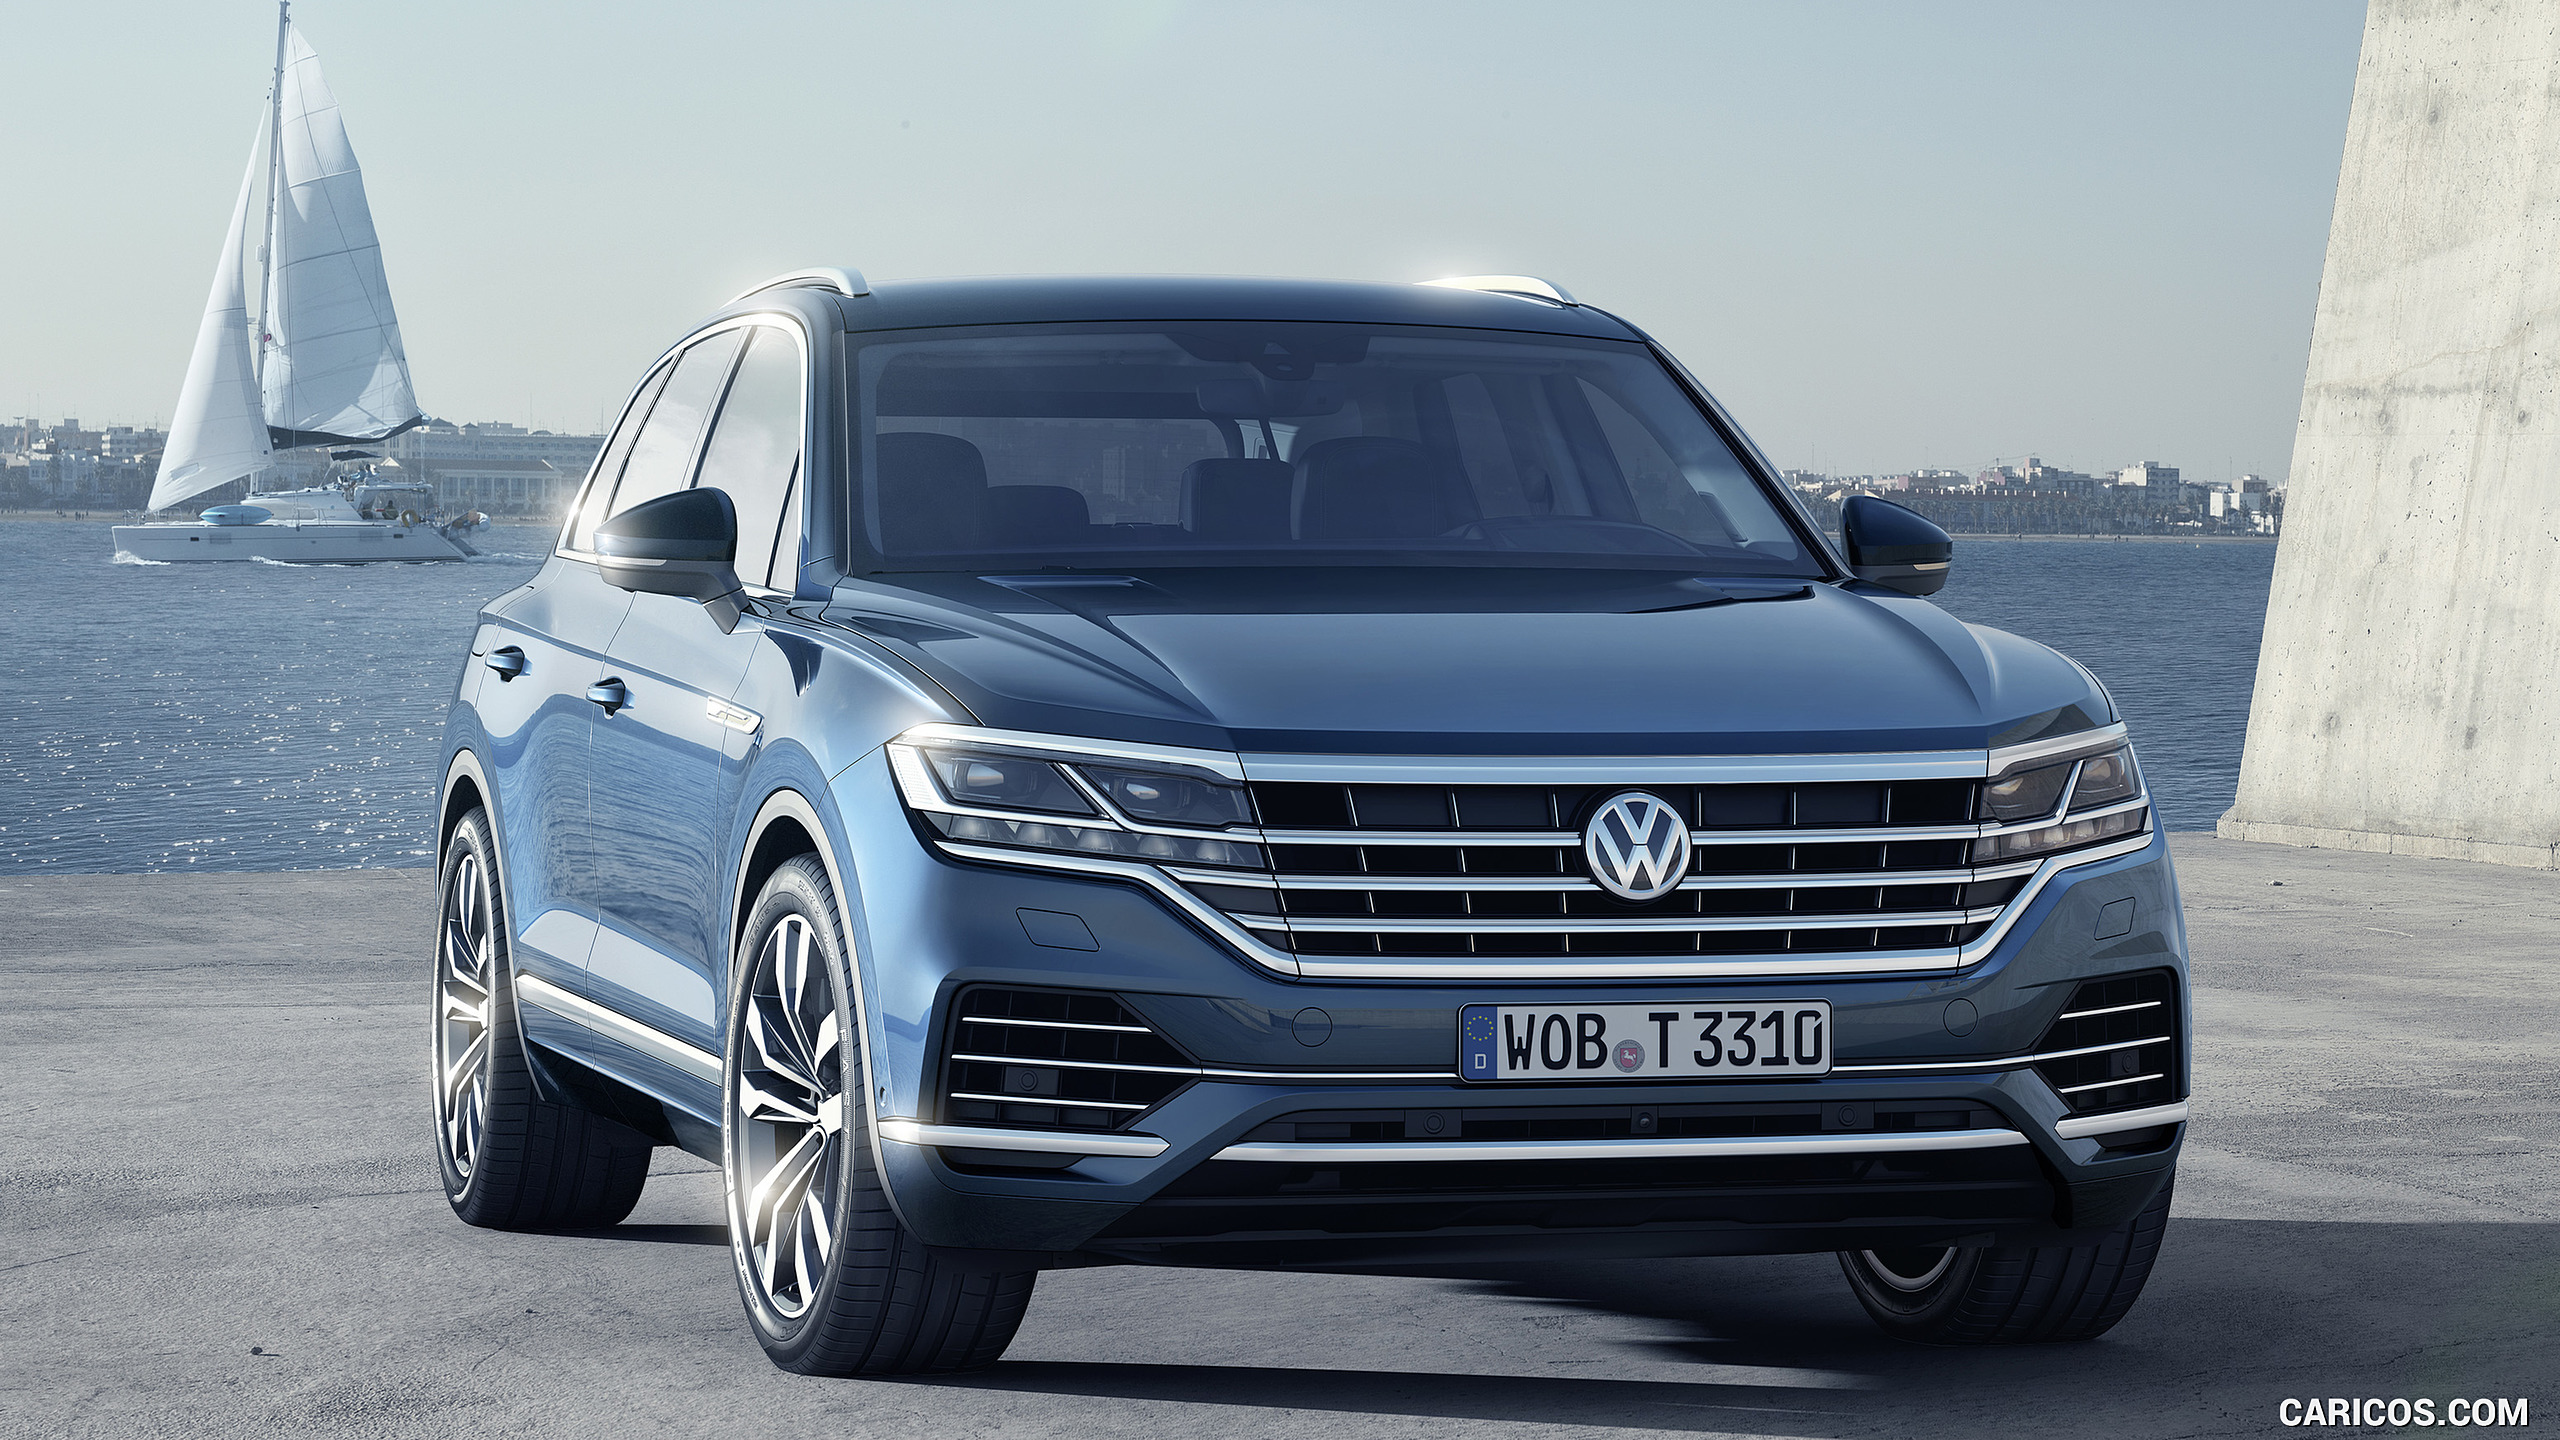 2019 Volkswagen Touareg   Front HD Wallpaper 16 2560x1440